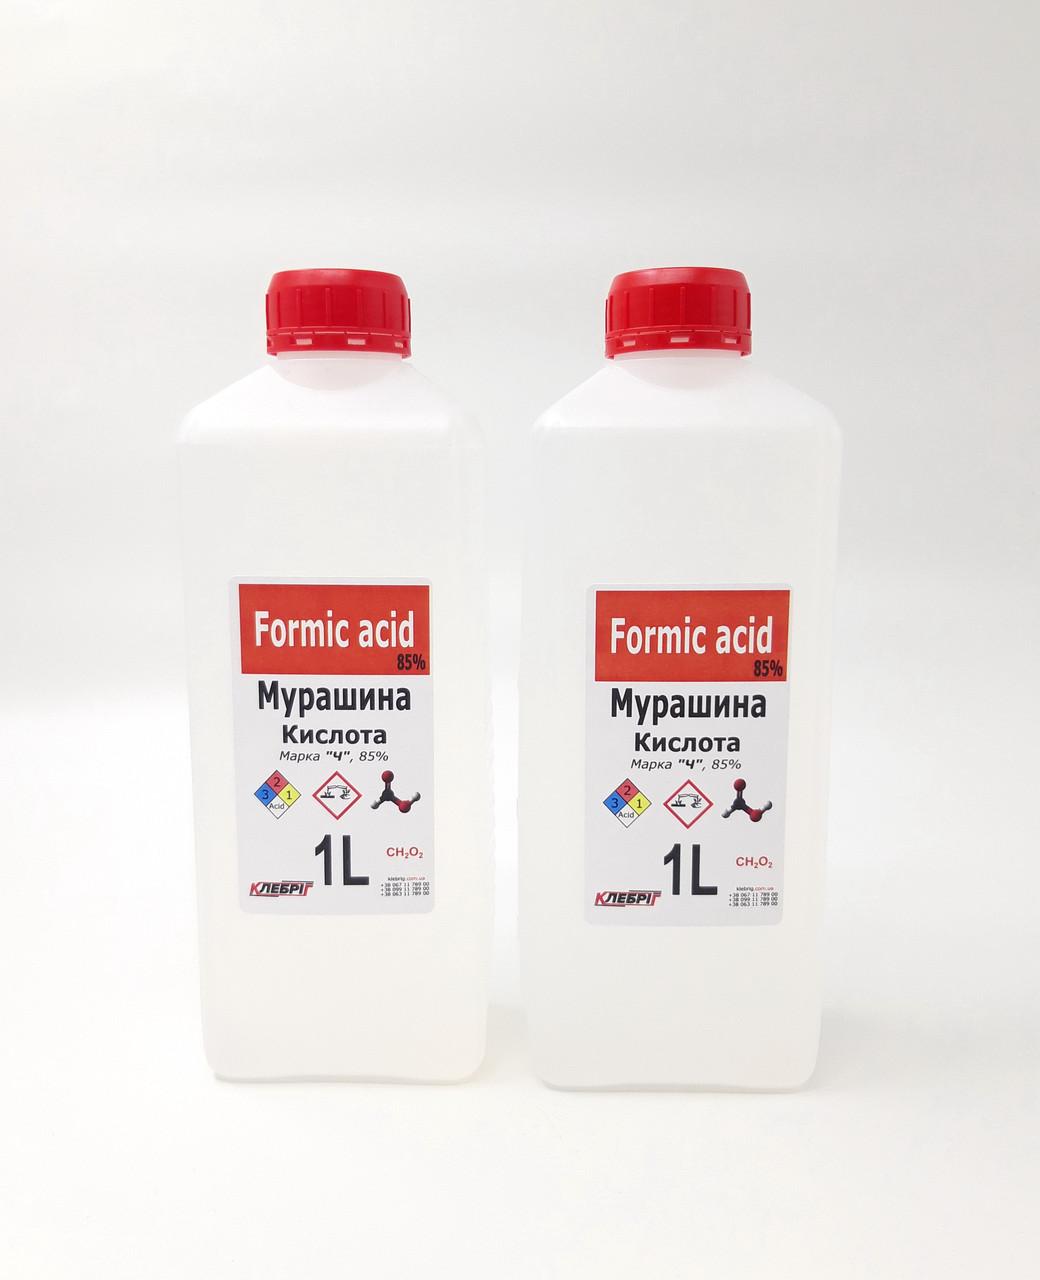 Муравьиная кислота 1л х2шт Мурашина 85%